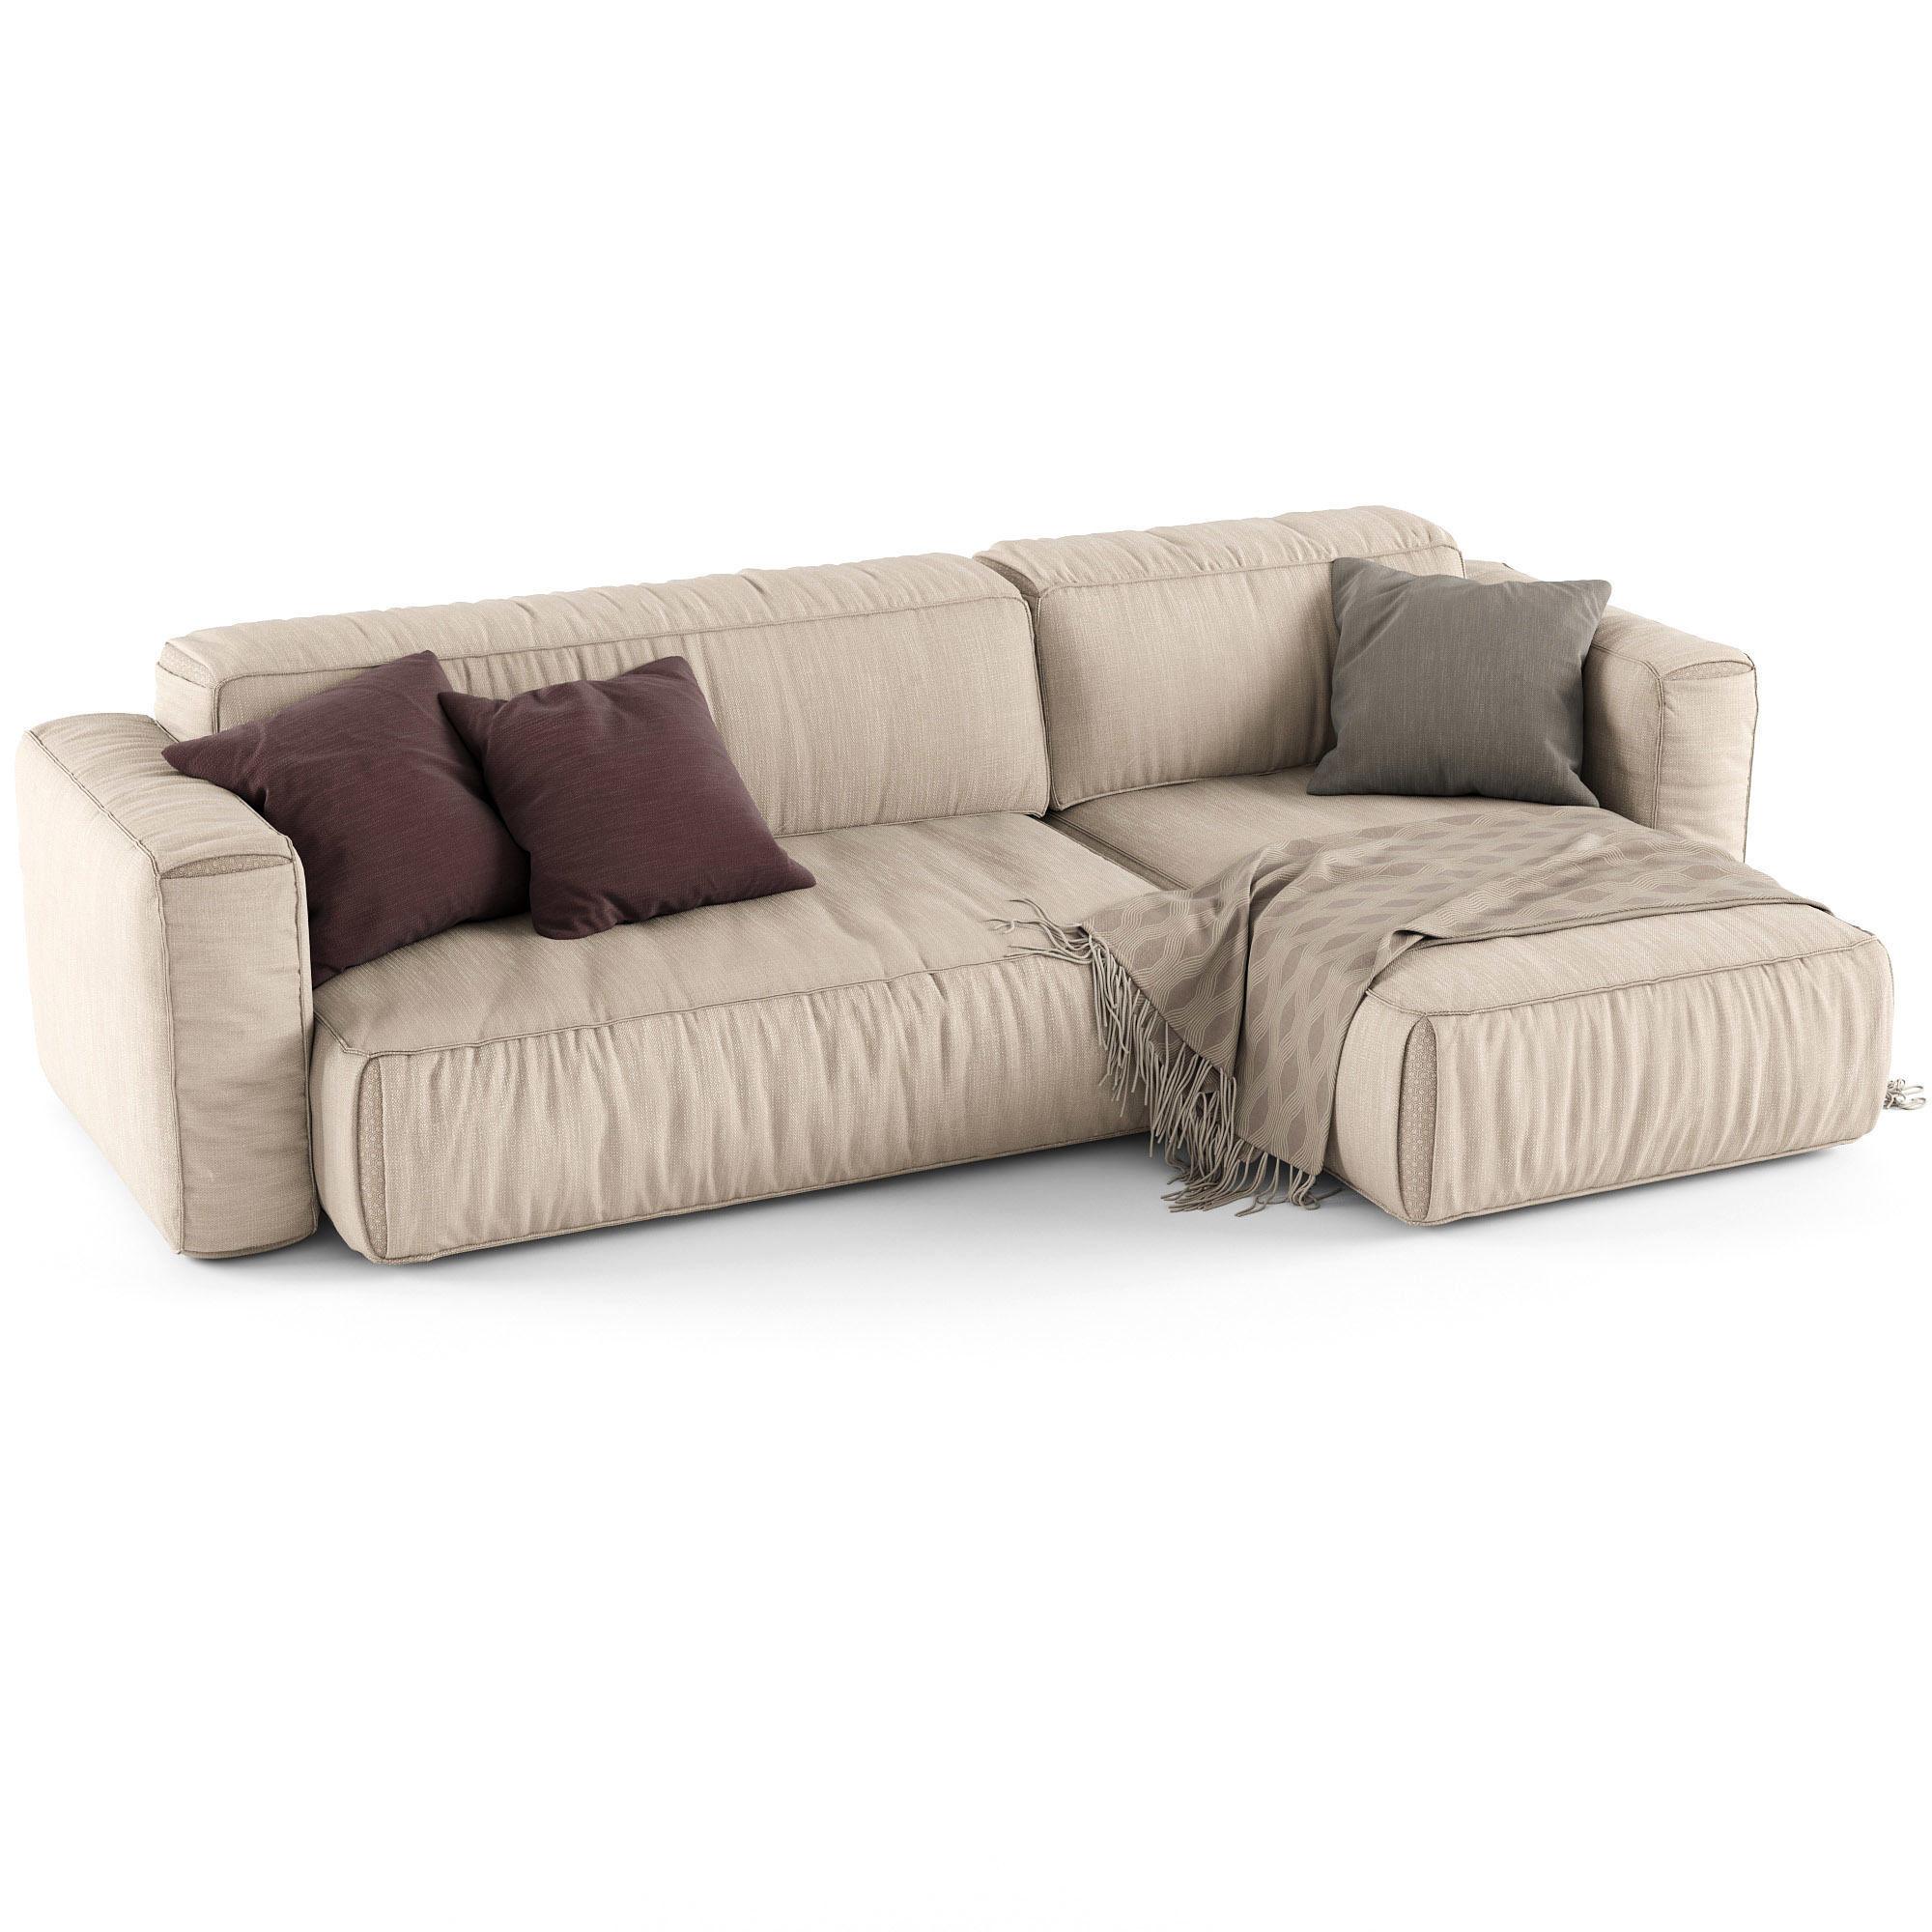 Koo International SOFT Sofa 1